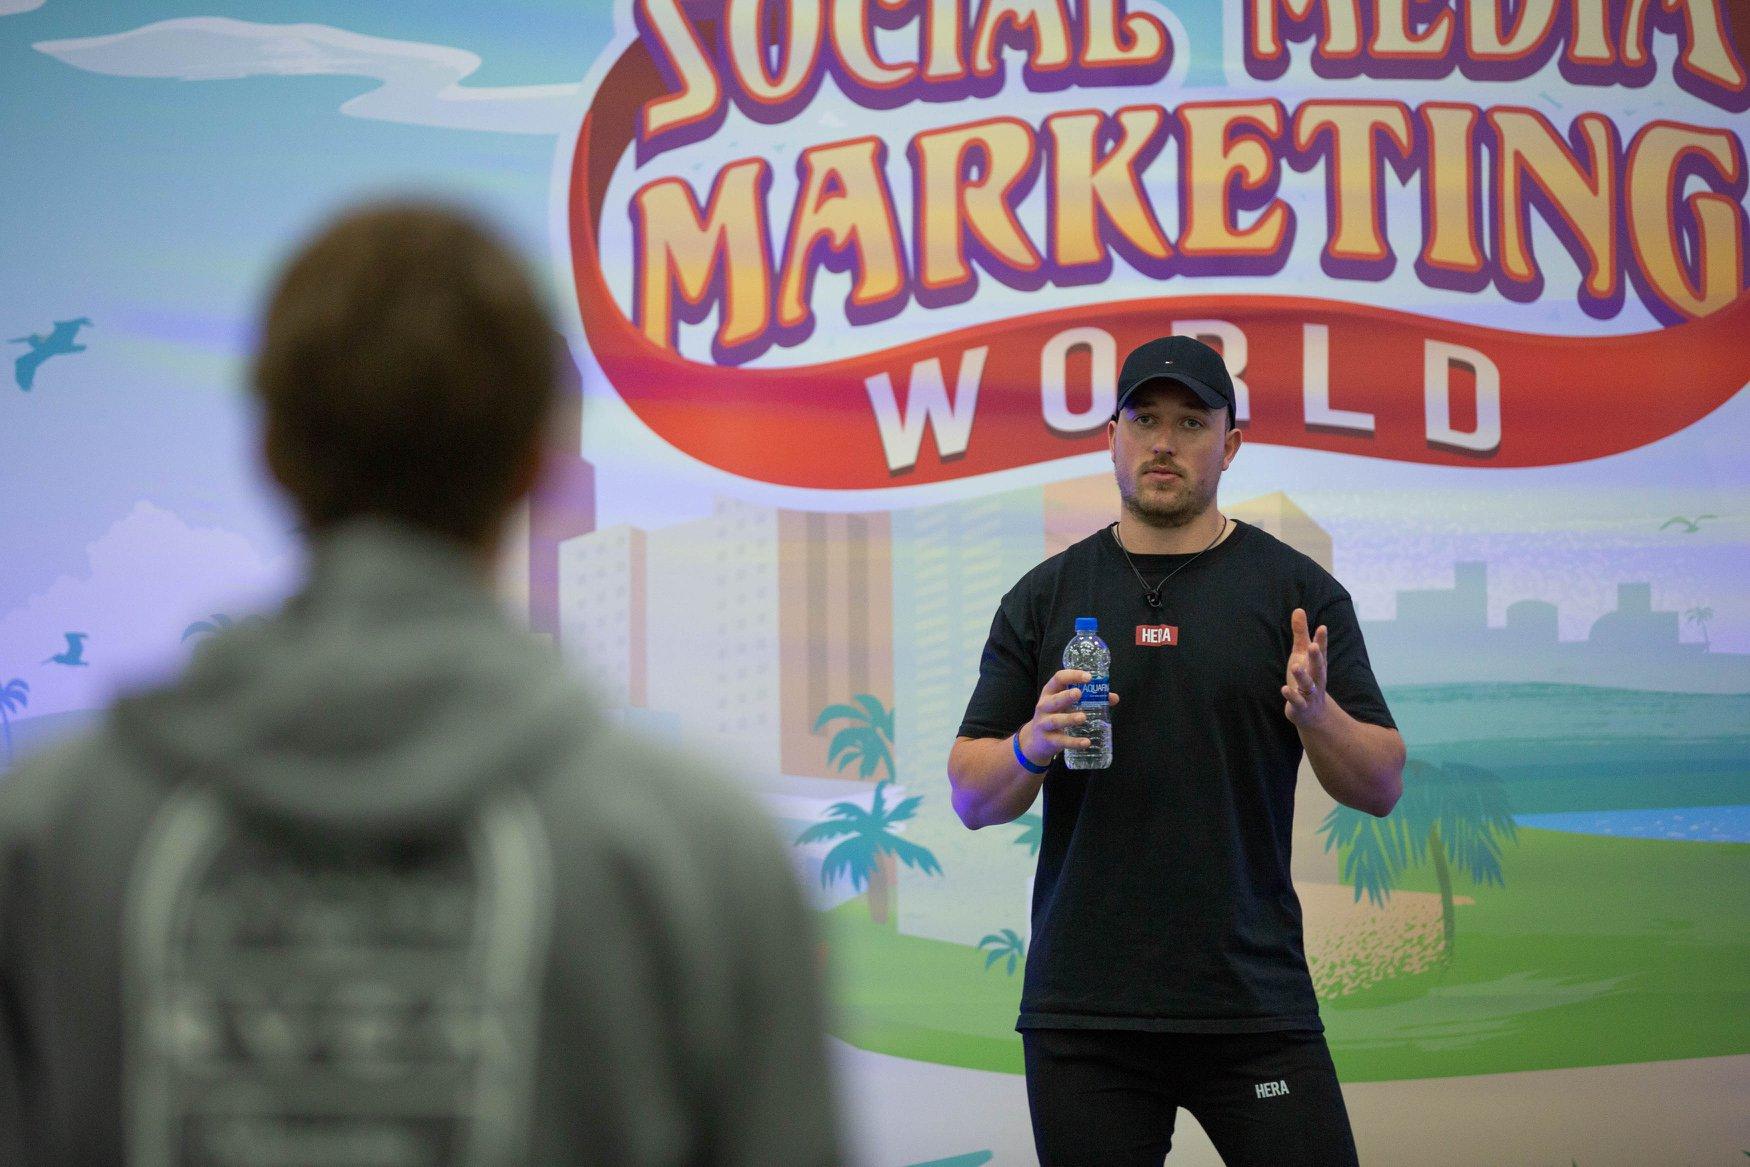 Dan Knowlton Social Media Marketing Speaker